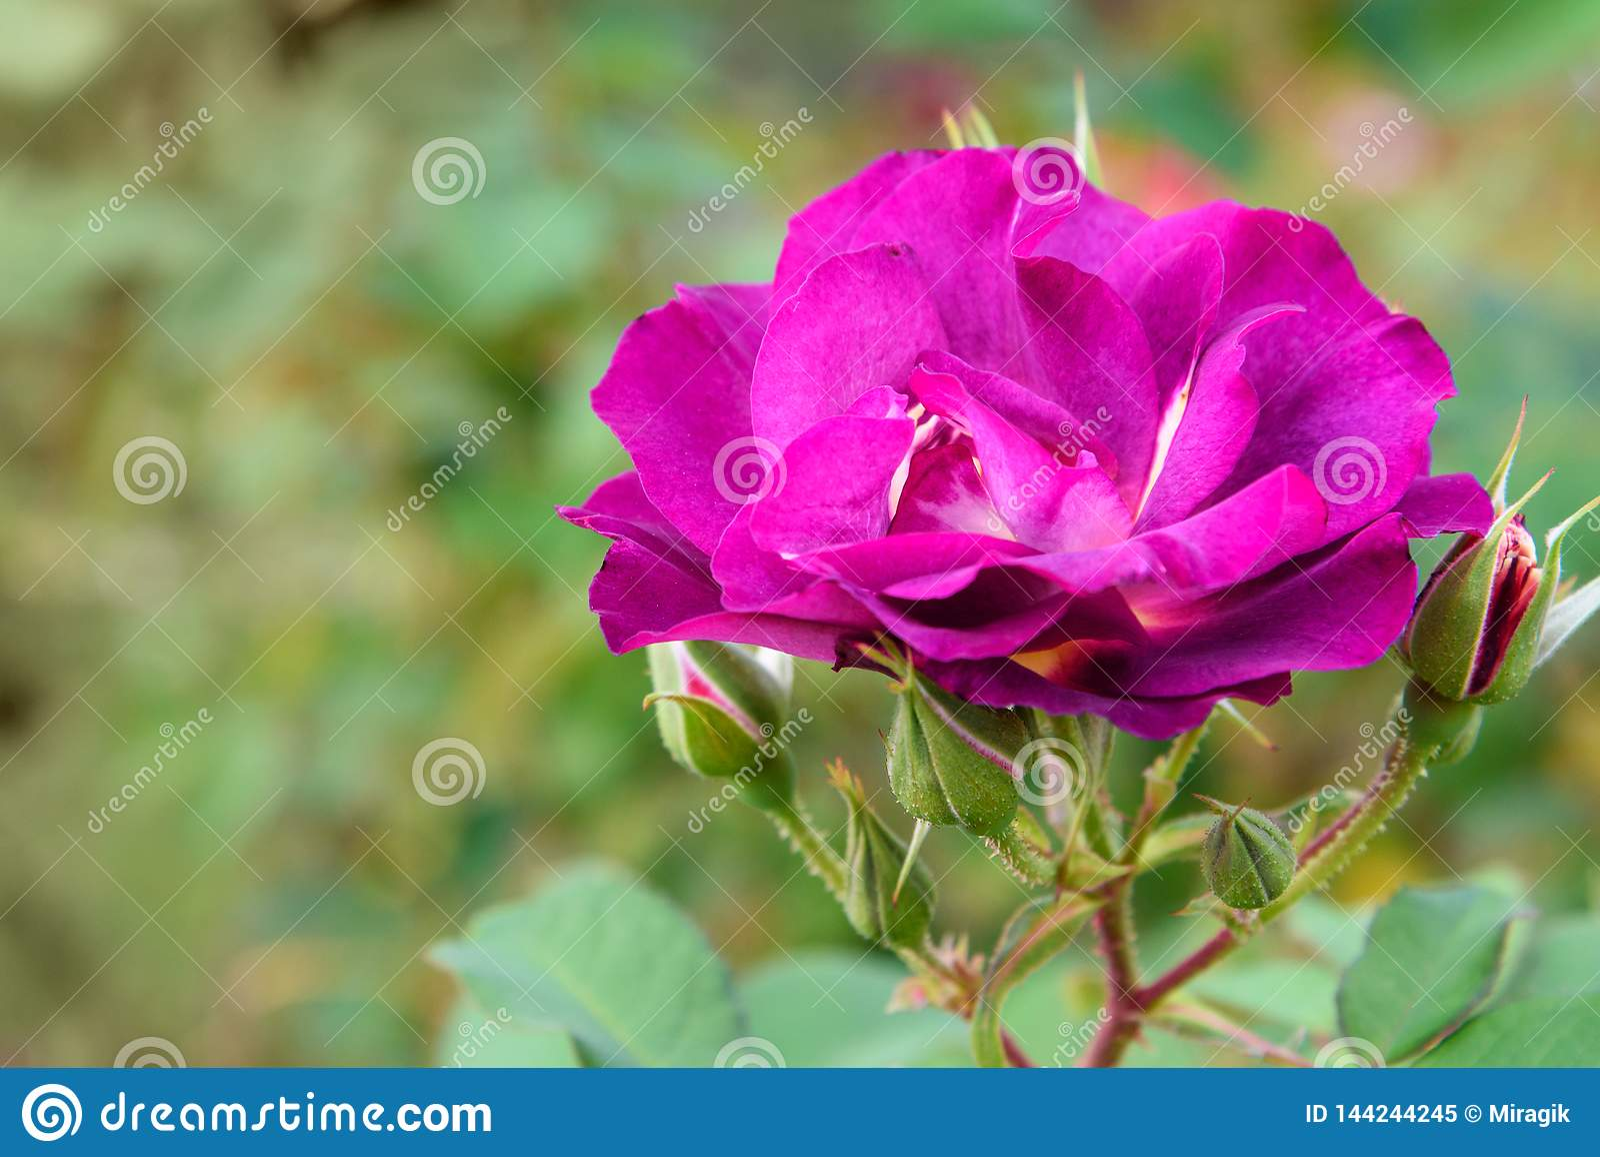 Princess Sibilla de Luxembourg rose in garden